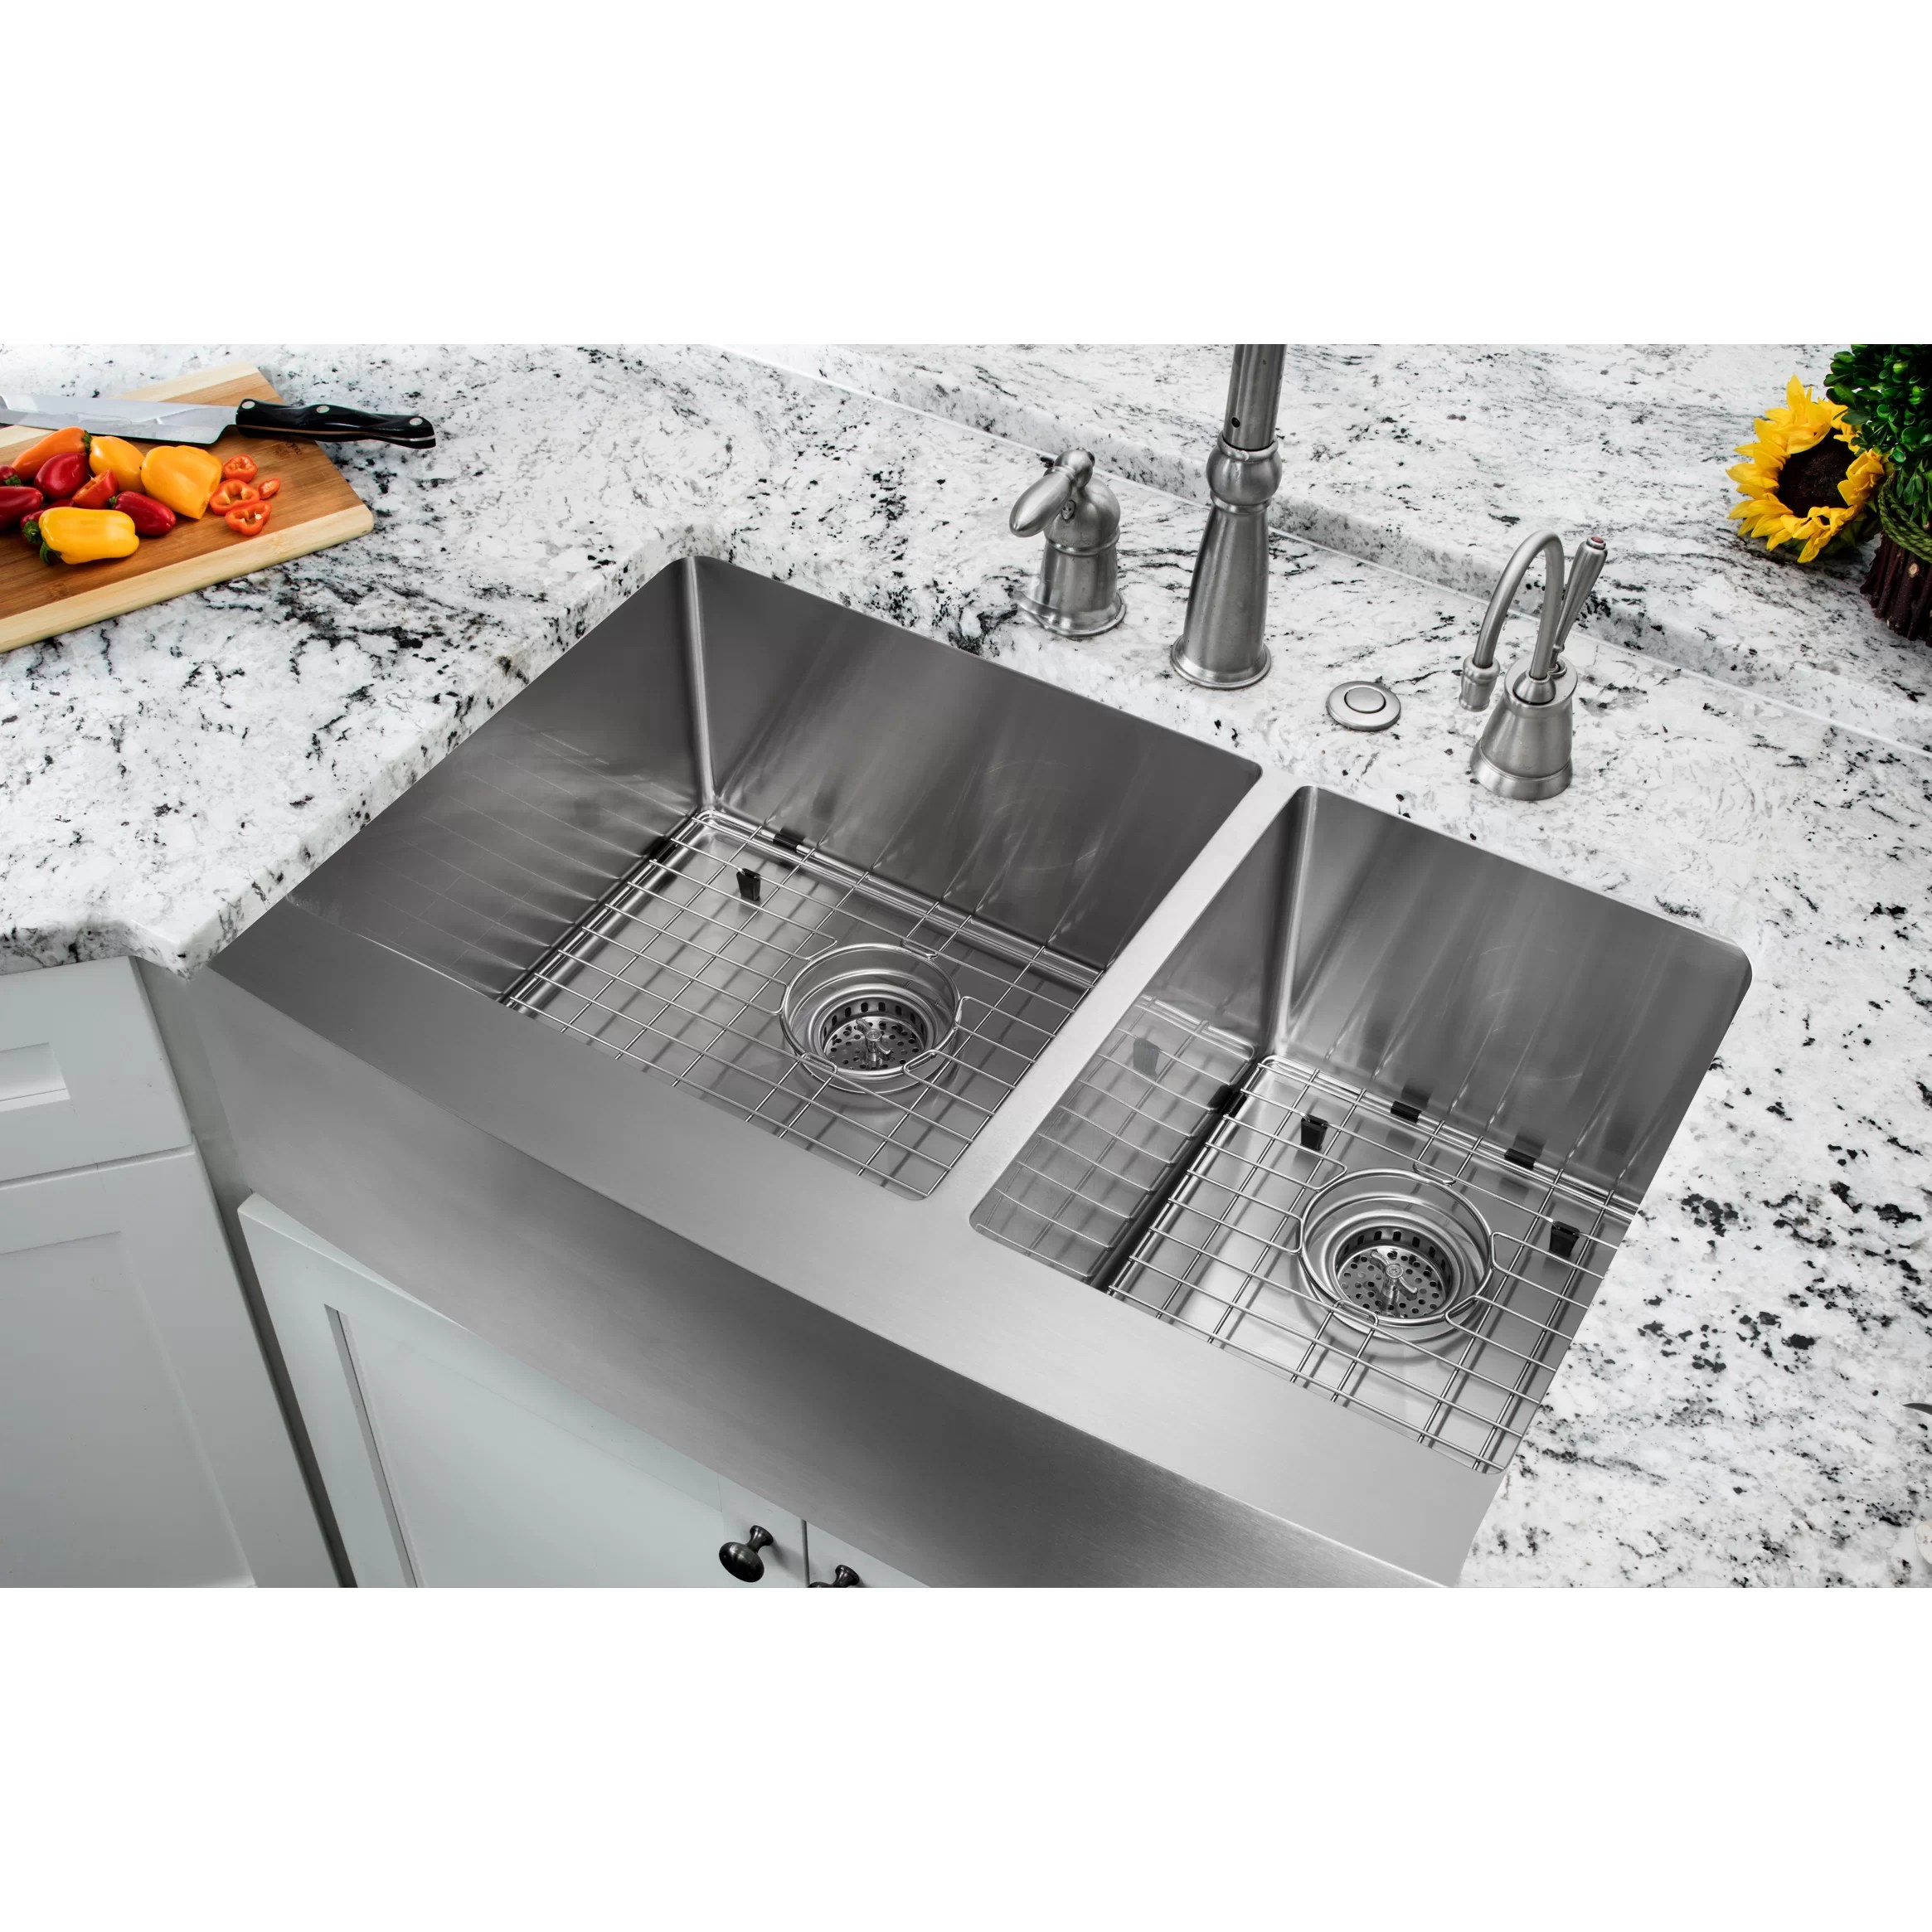 All Kitchen Sinks l c O~Farmhouse+ 5BS 5D+Apron apron front kitchen sink 35 20 75 Double Bowl Farmhouse Apron Kitchen Sink